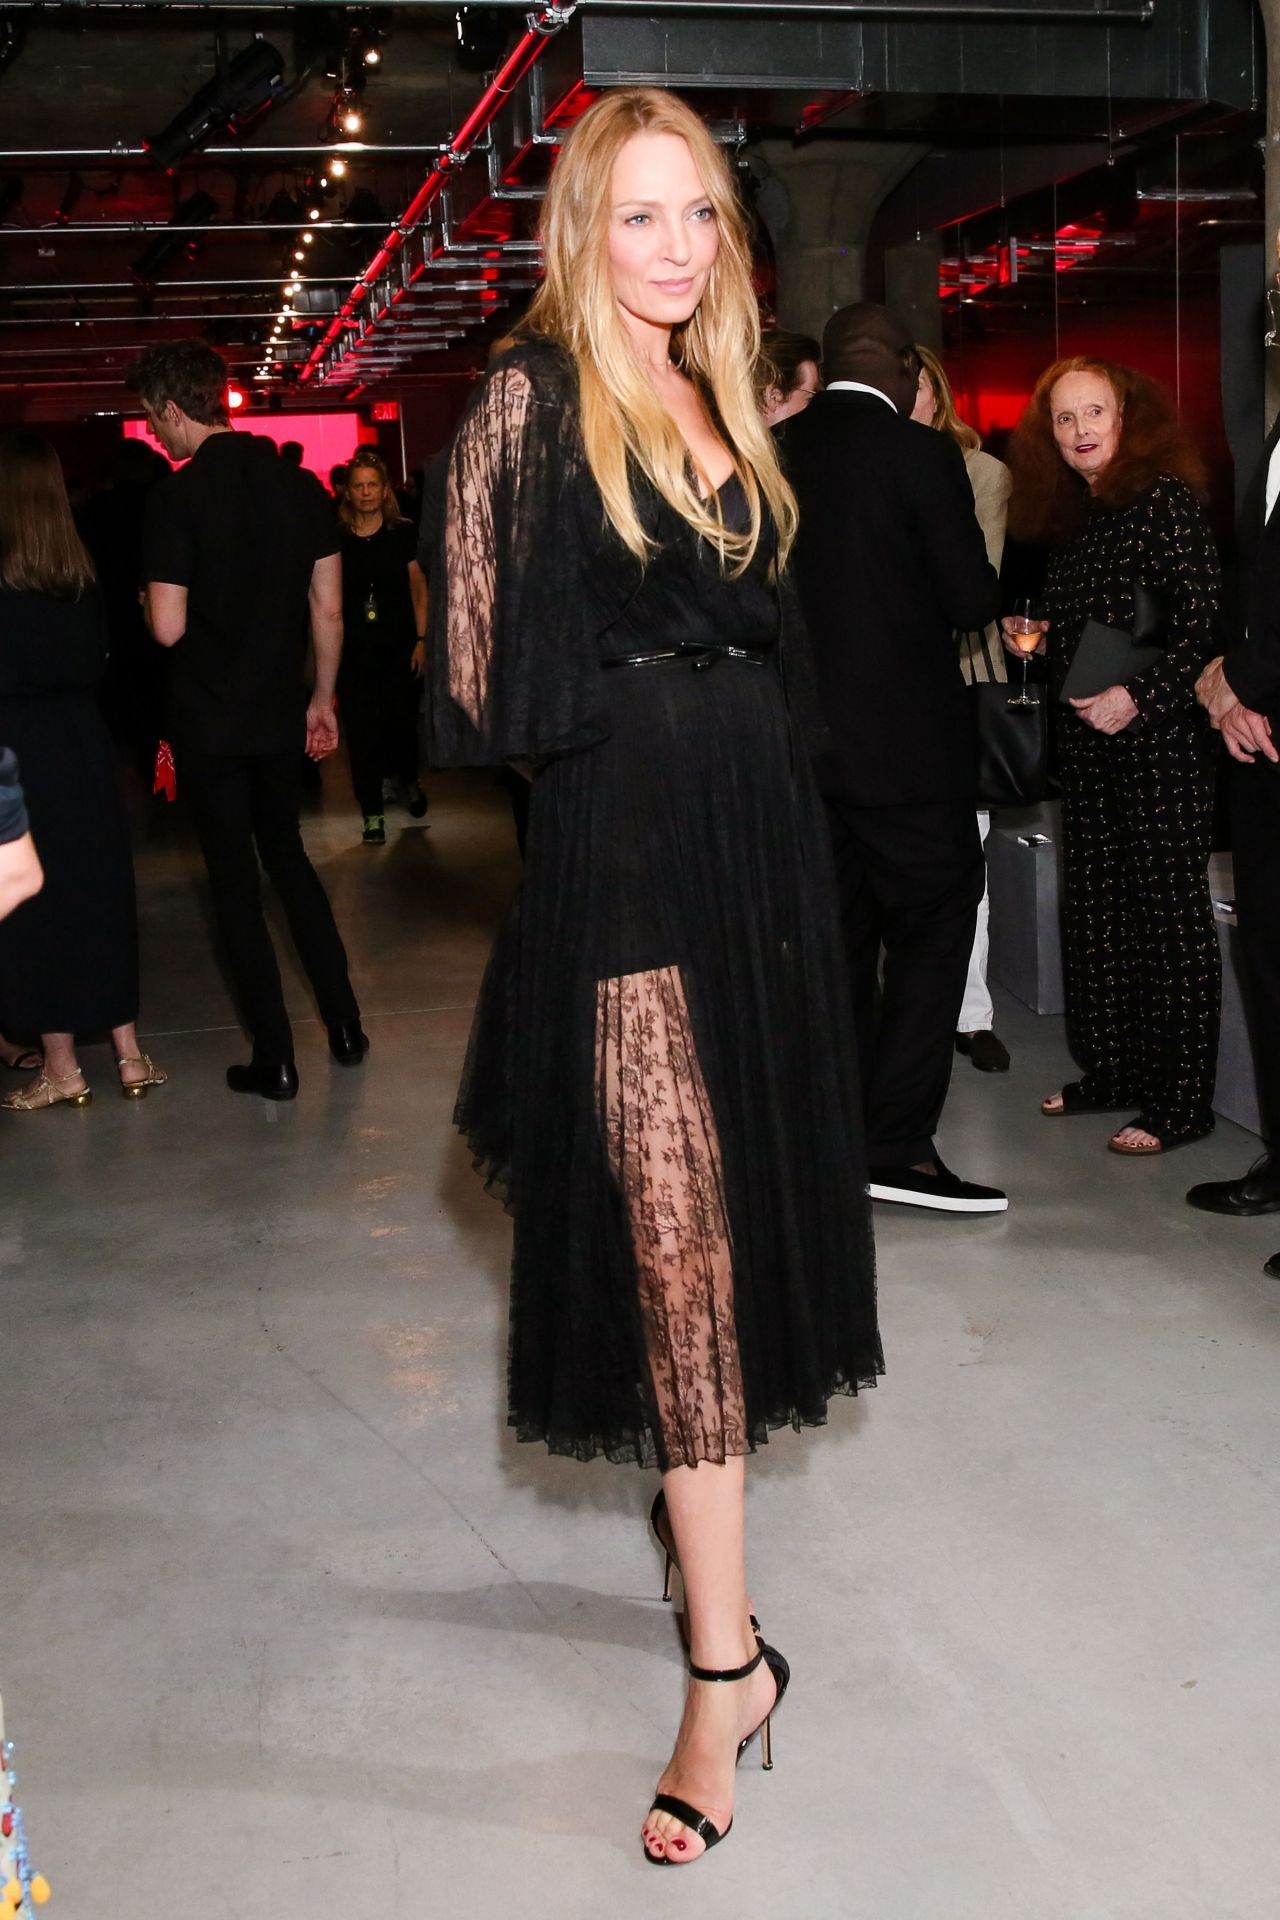 Uma Thurman Prada Resort 2019 Show In Nyc 05 04 2018 Uma Thurman Fashion Art Fashion